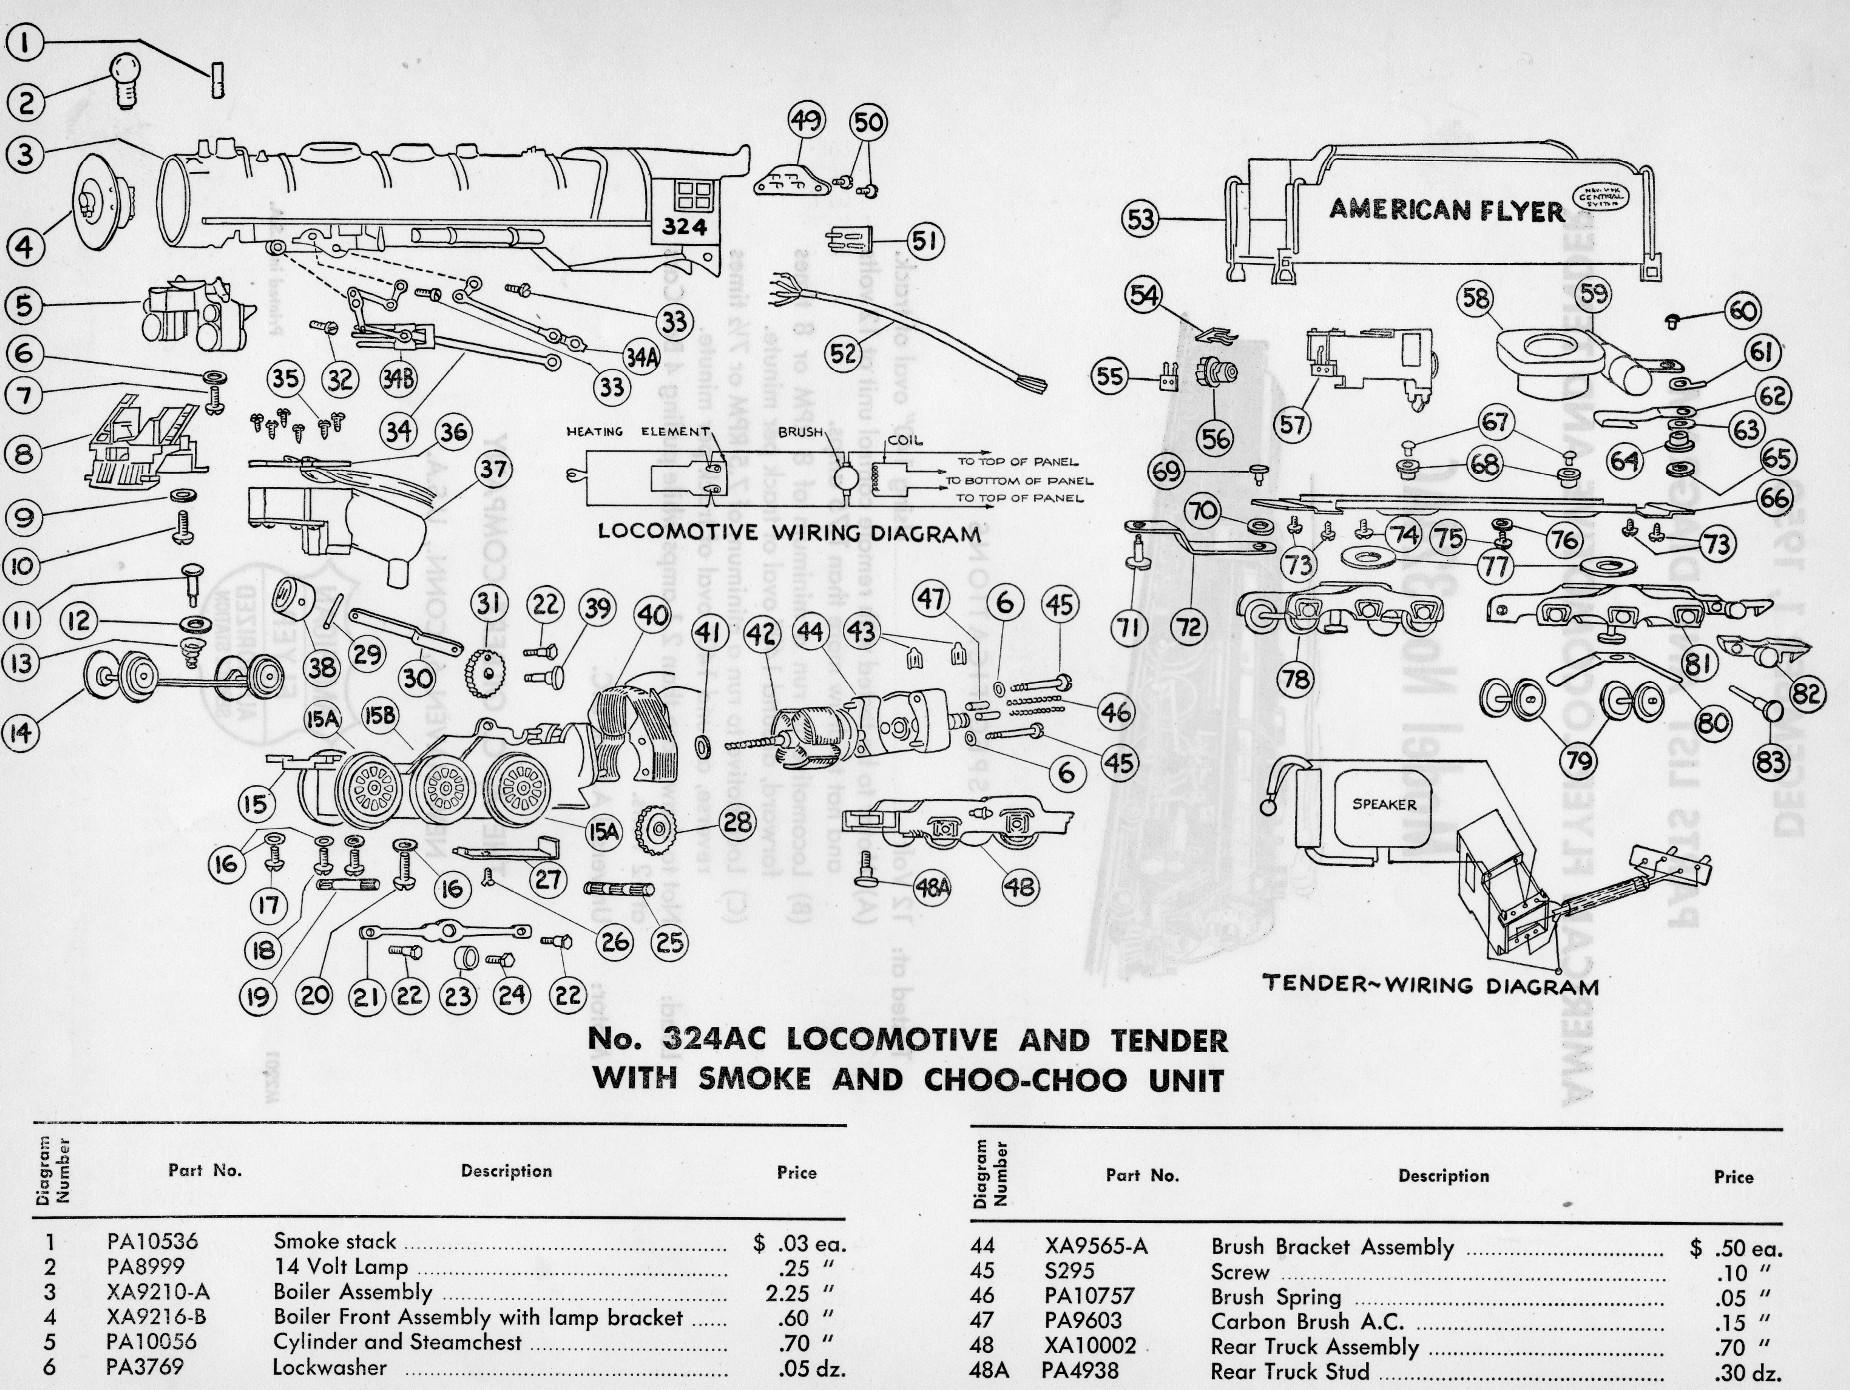 American Flyer Locomotive 324ac Parts List  U0026 Diagram